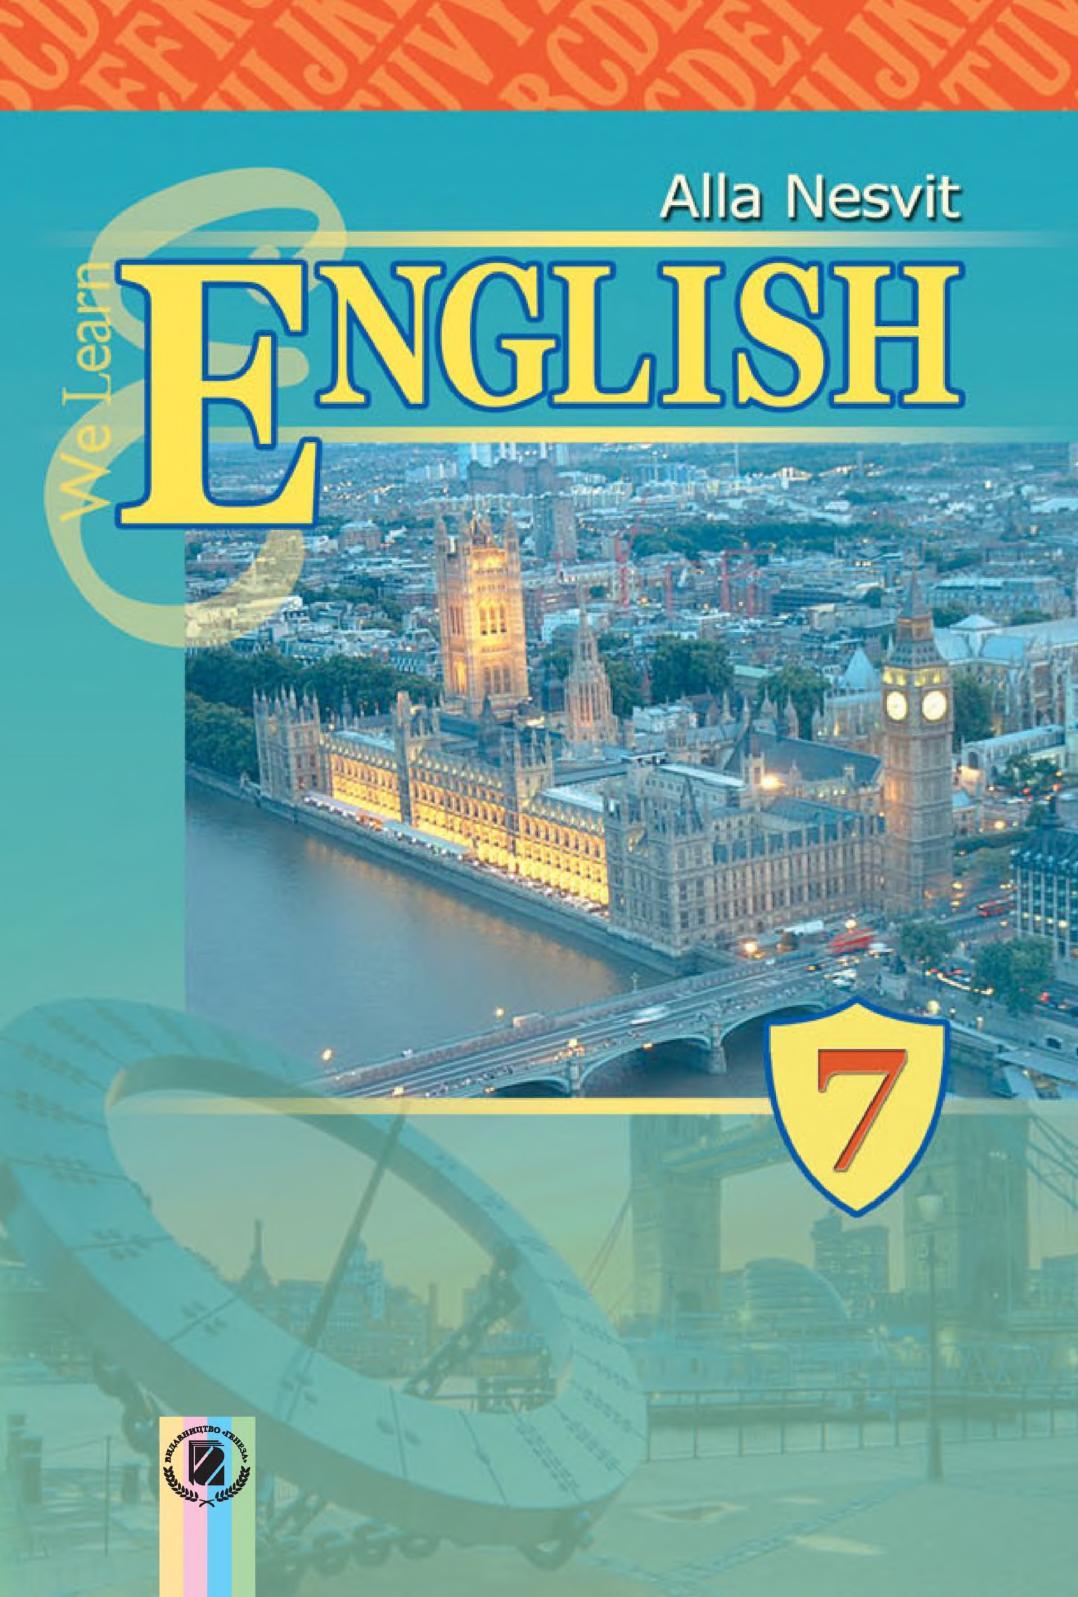 Calaméo - 7 клас. Англійська мова Nesvit 2015